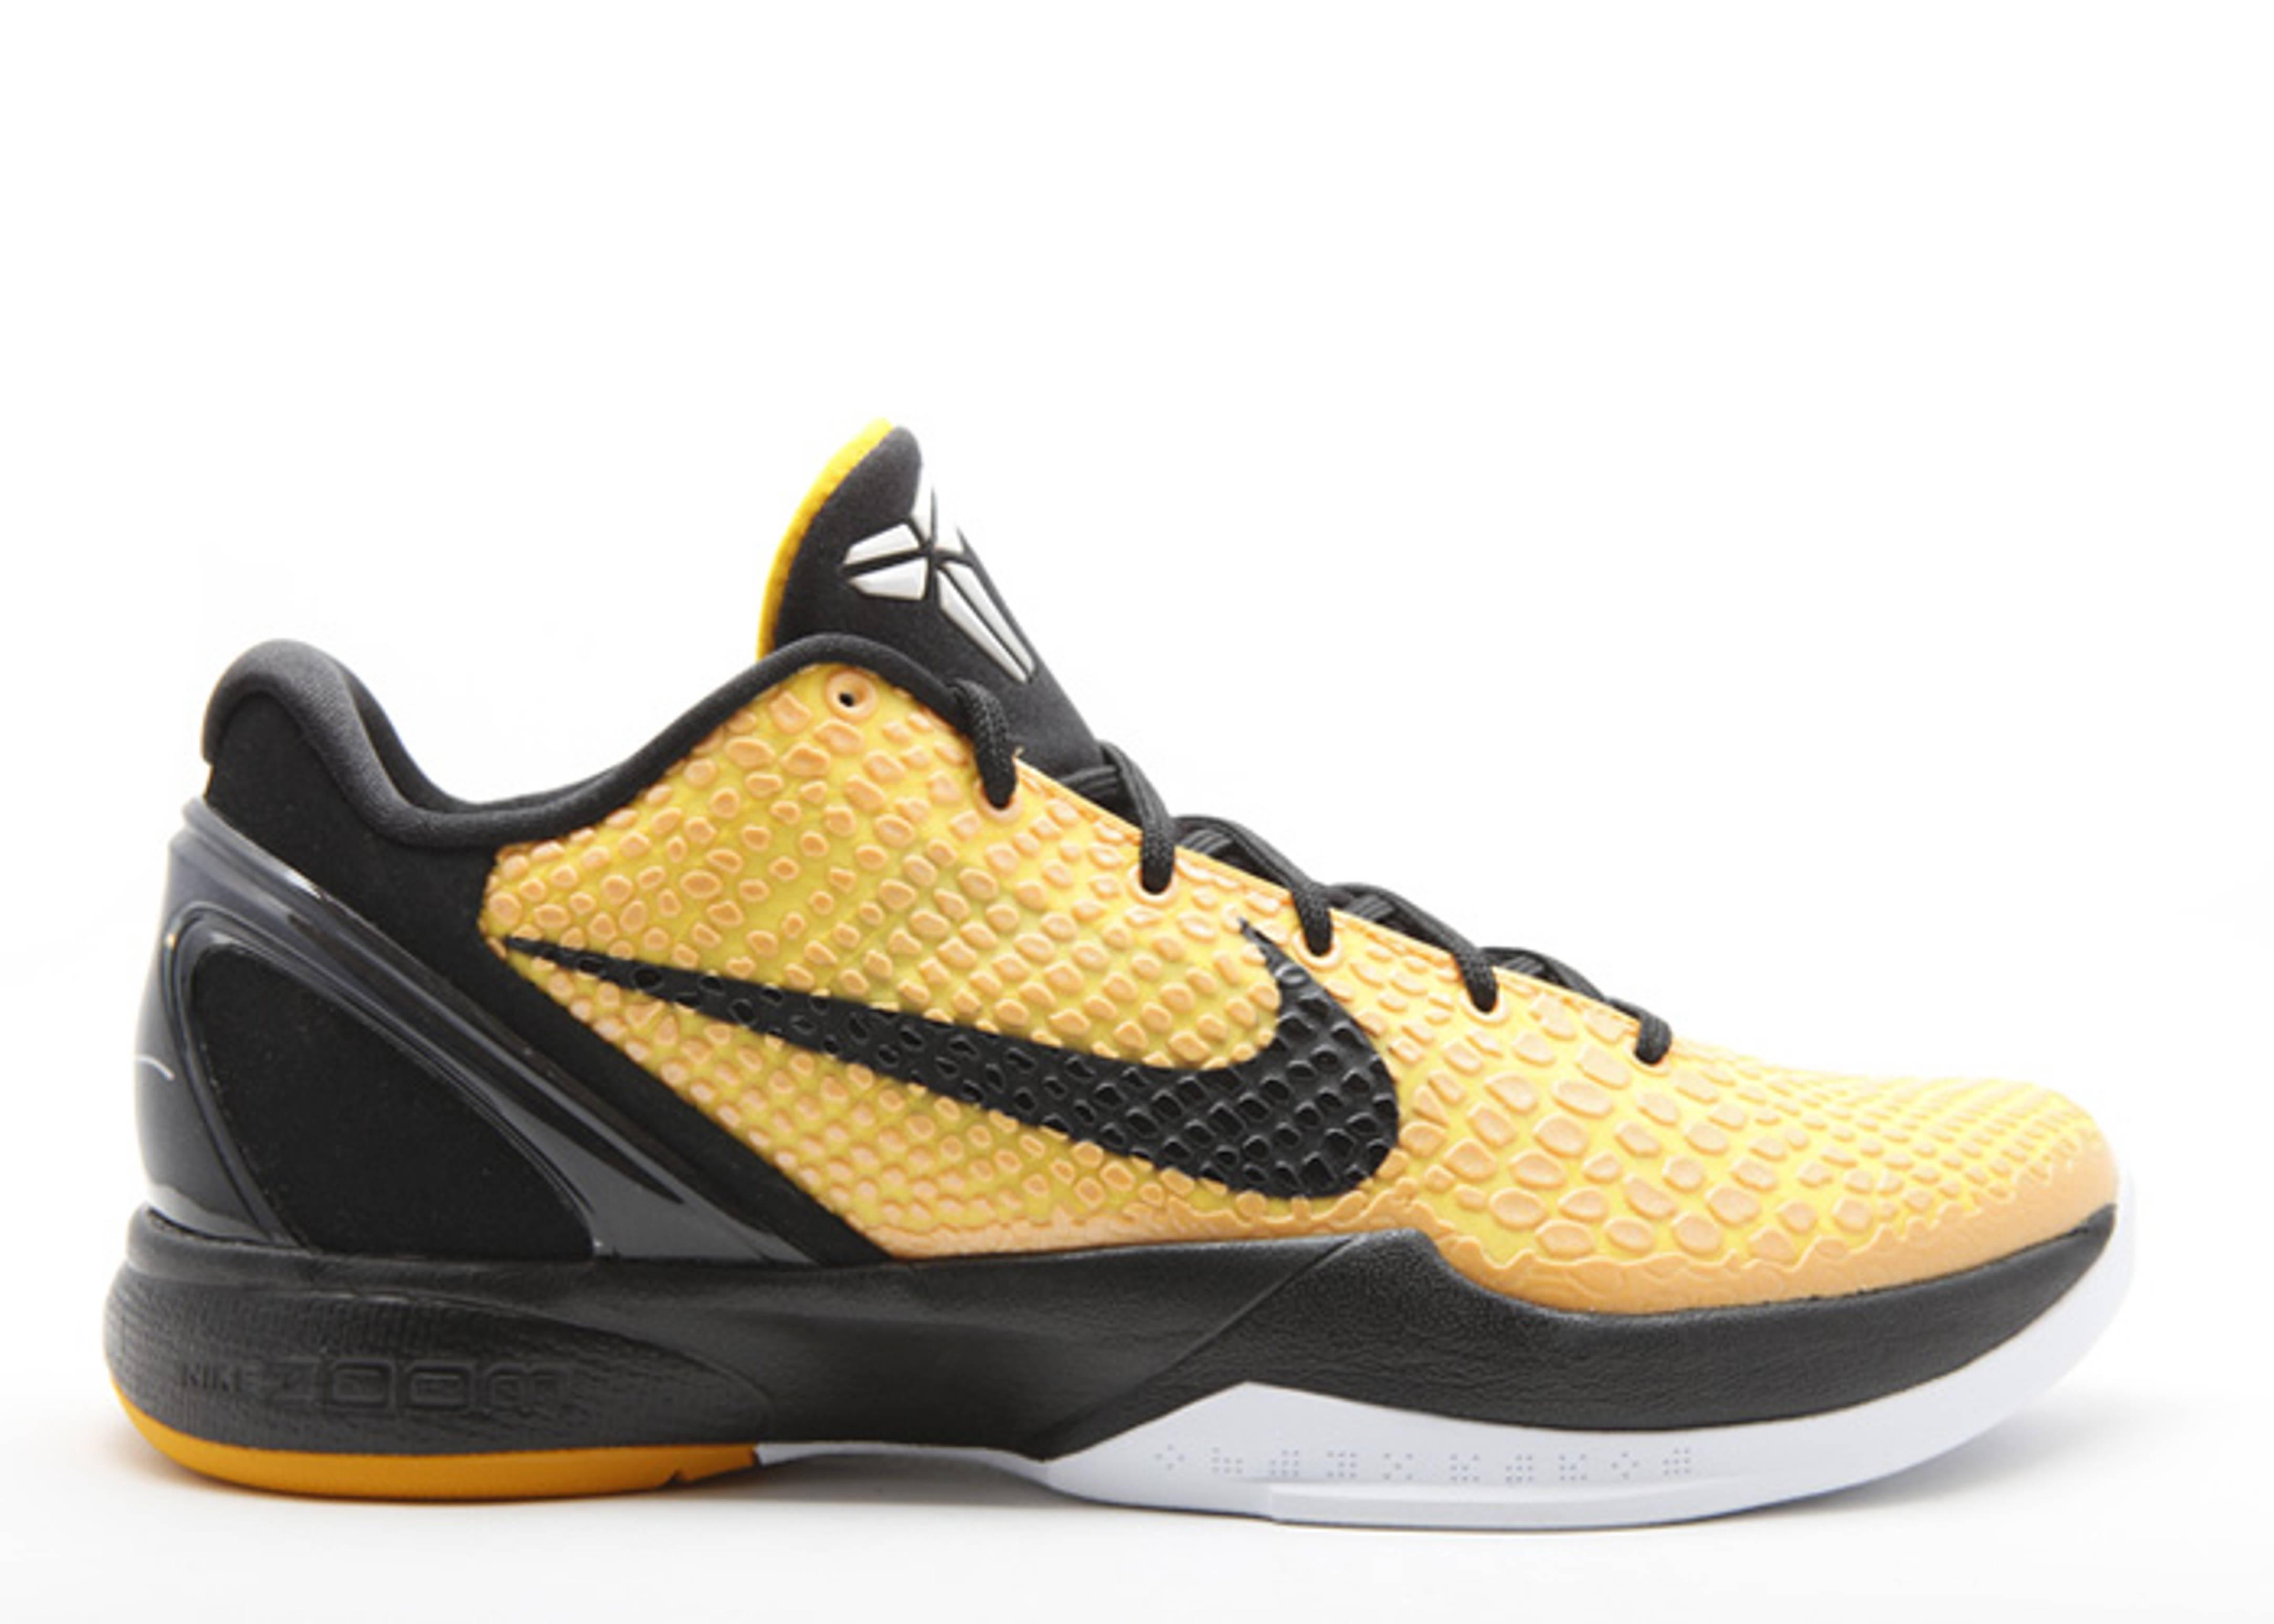 Zoom Kobe 6 - Nike - 429659 700 - del sol black-tr yellow-white ... 83c8d041c